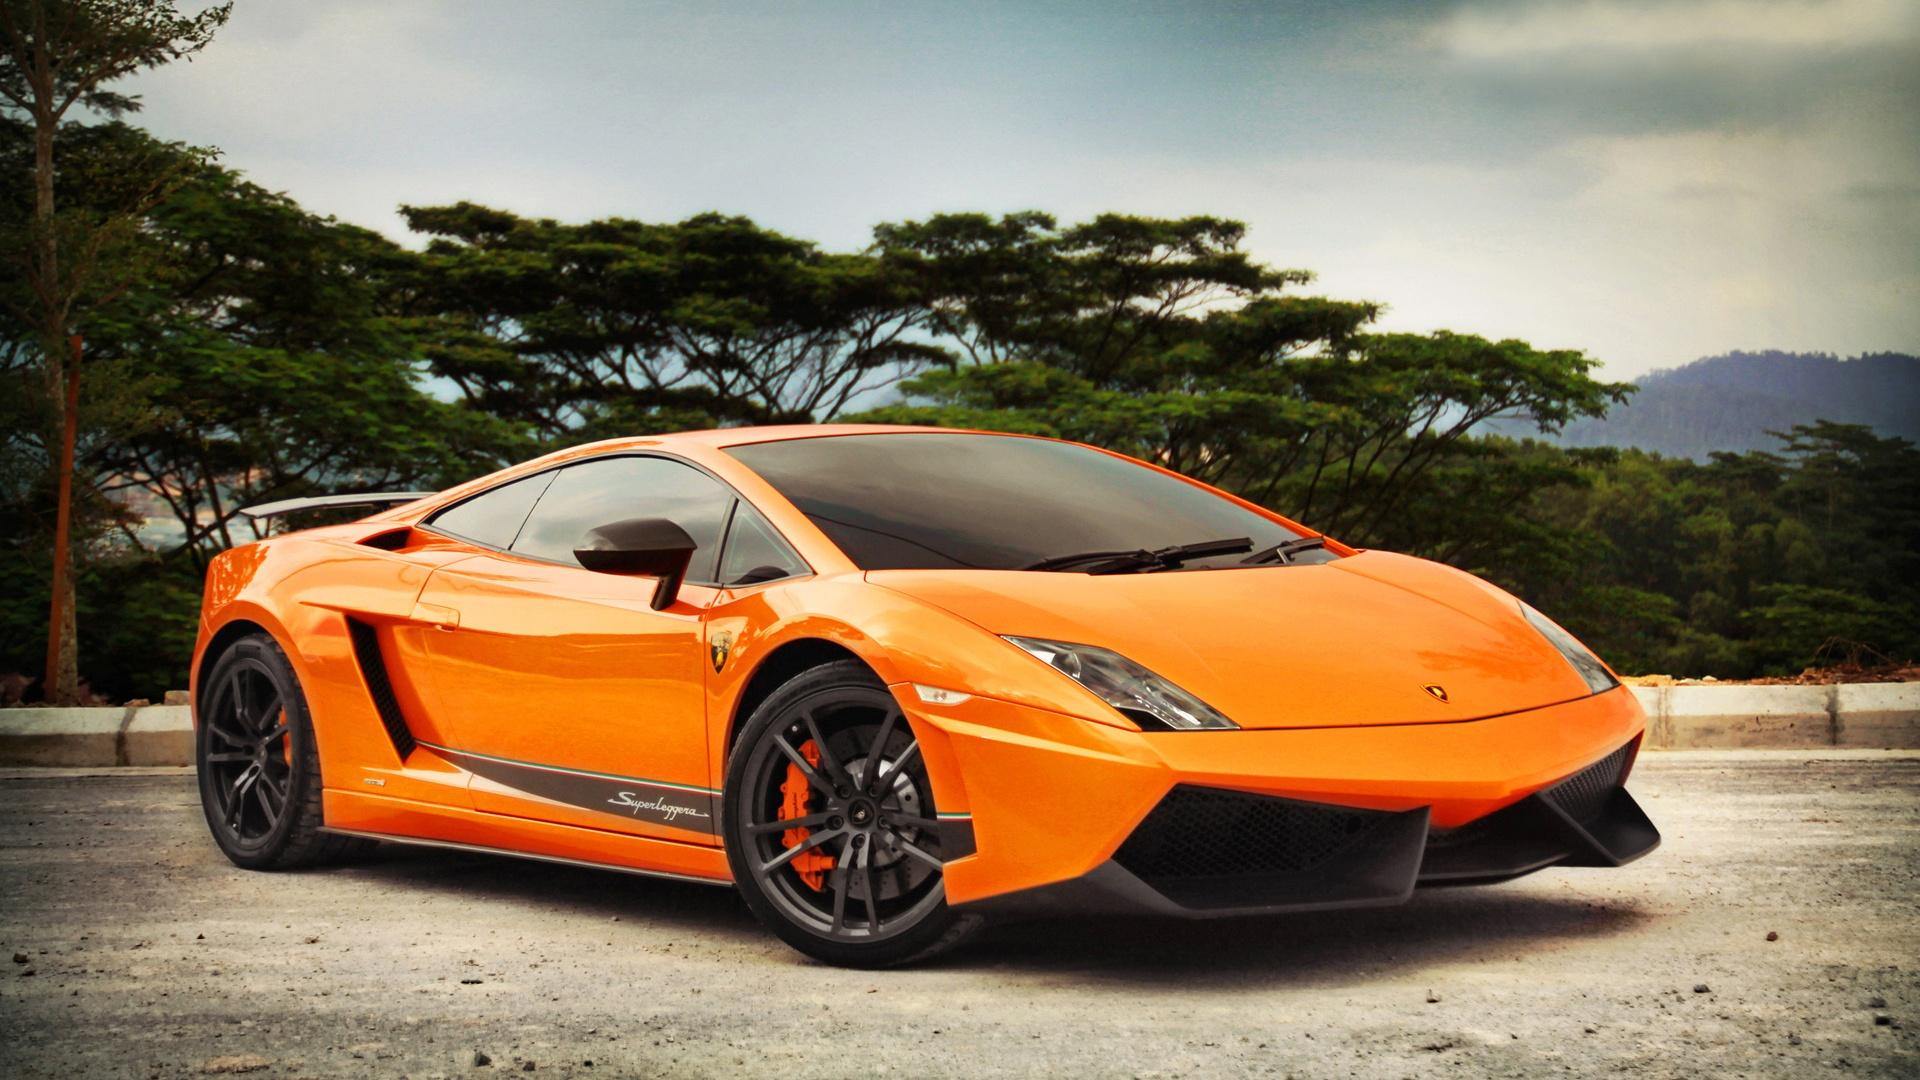 Lamborghini Gallardo LP570-4 orange color Wallpaper | 1920x1080 Full ...